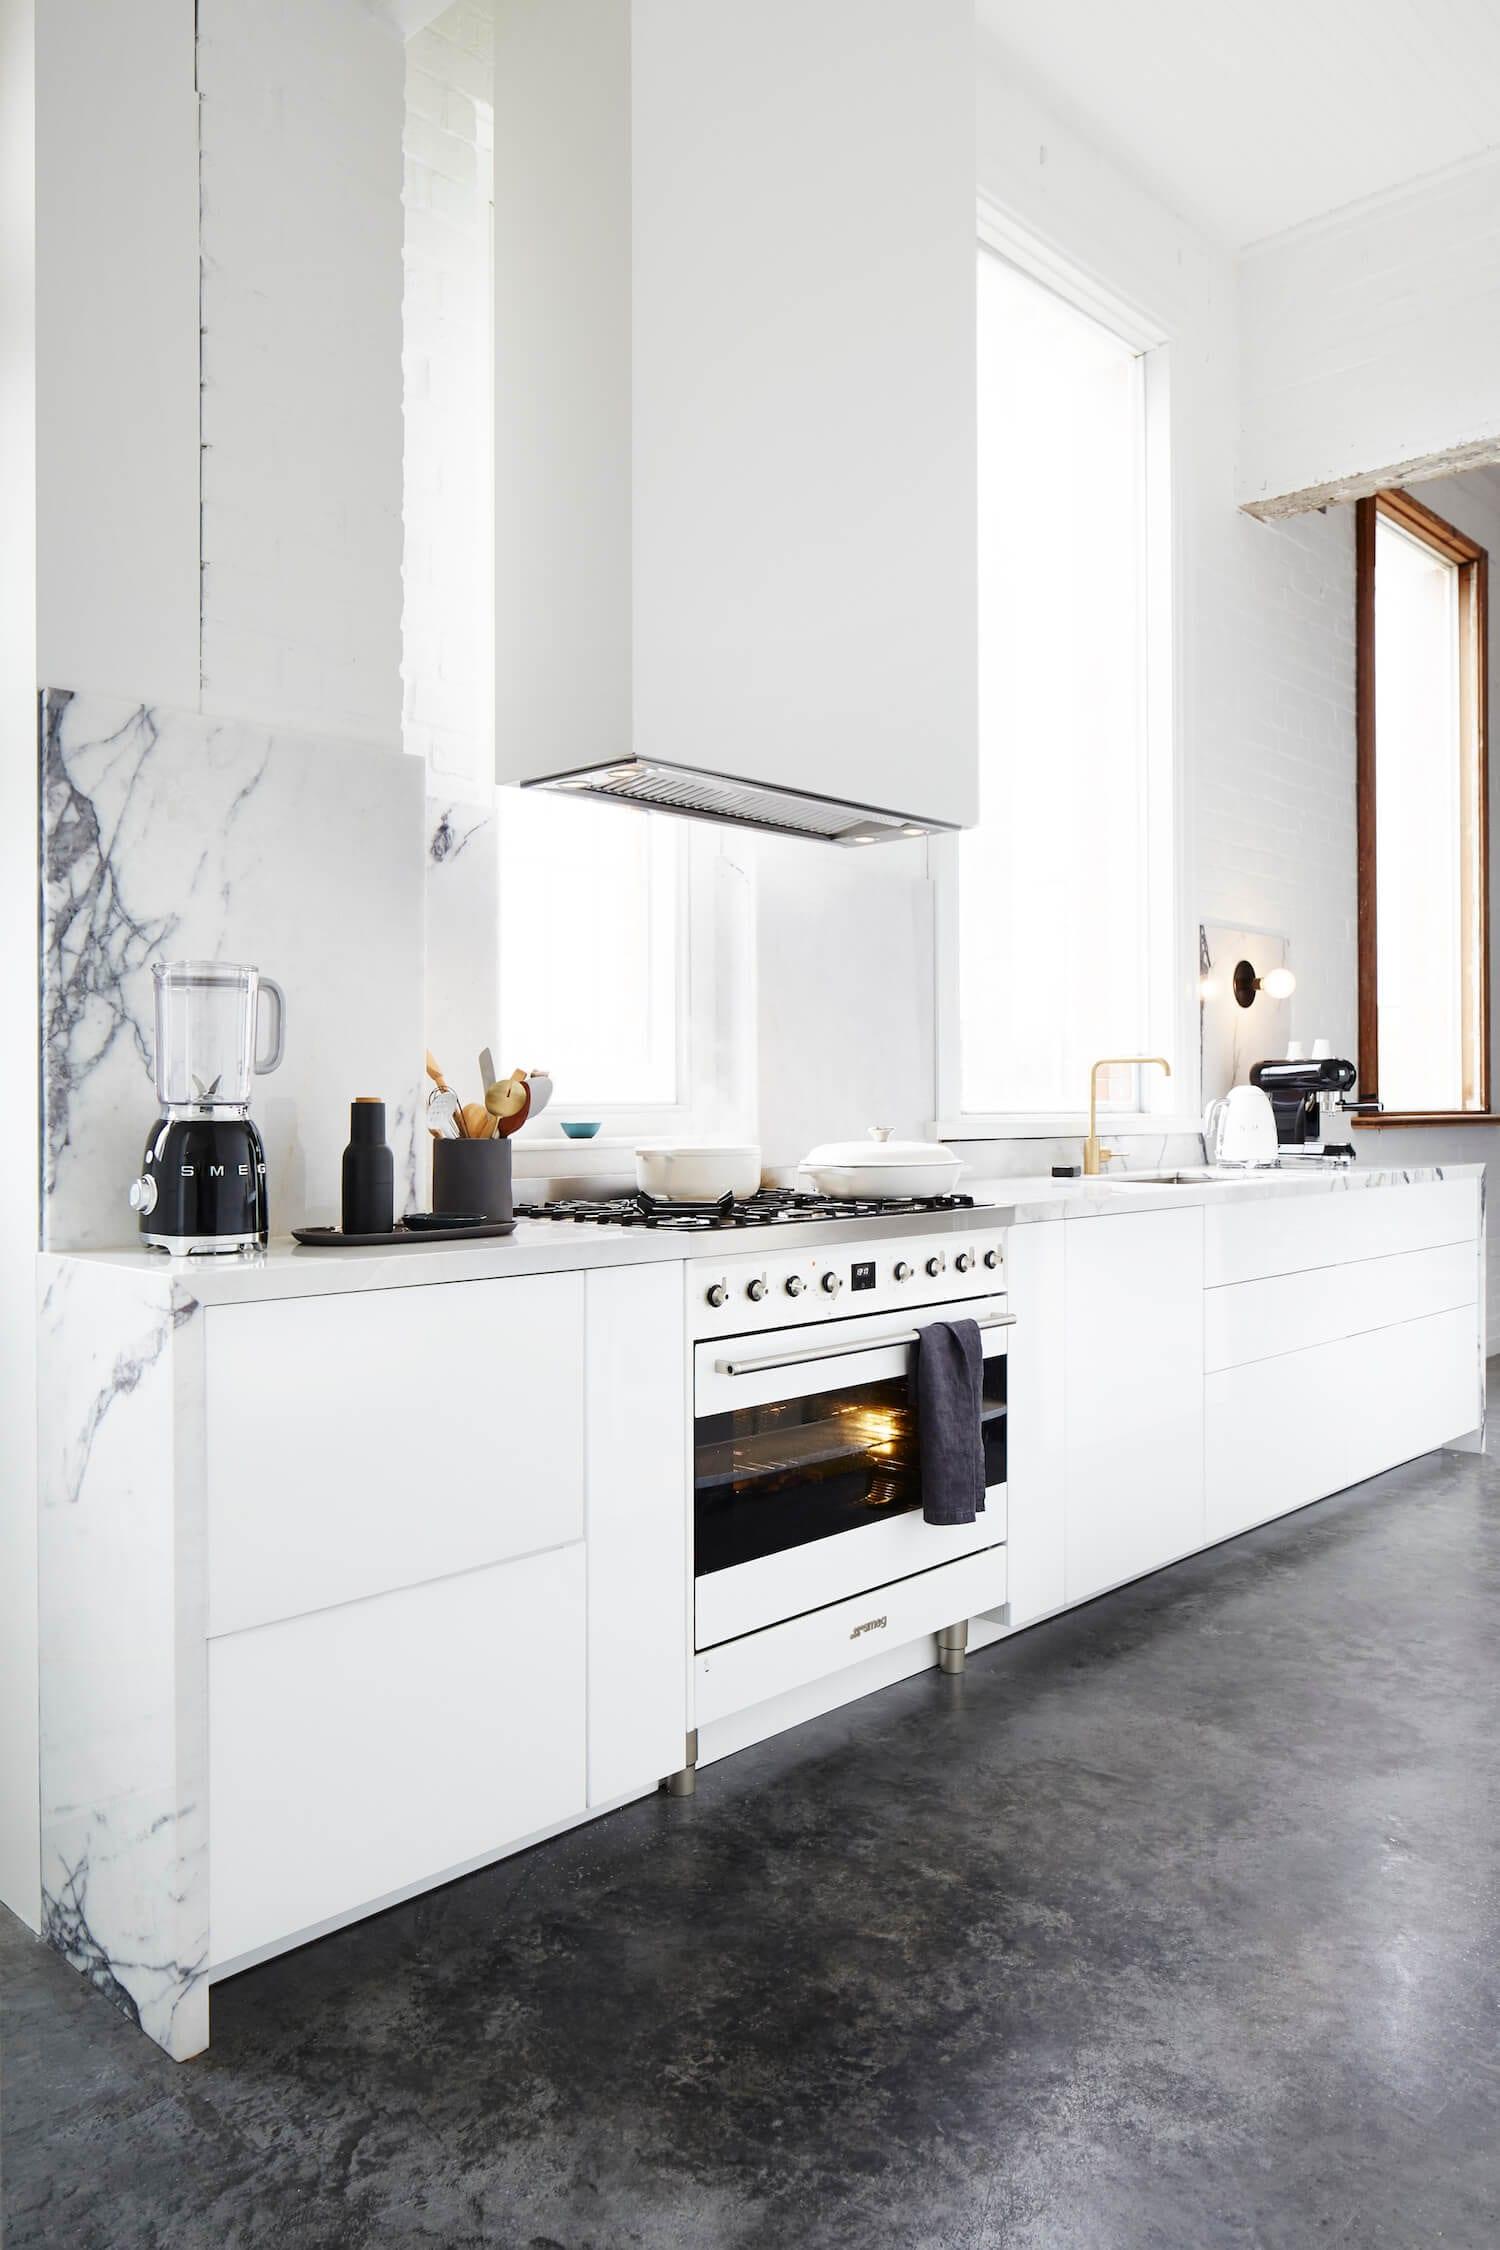 Smeg Freestanding Cooker in Armelle Habib's Studio Kitchen   Yellowtrace